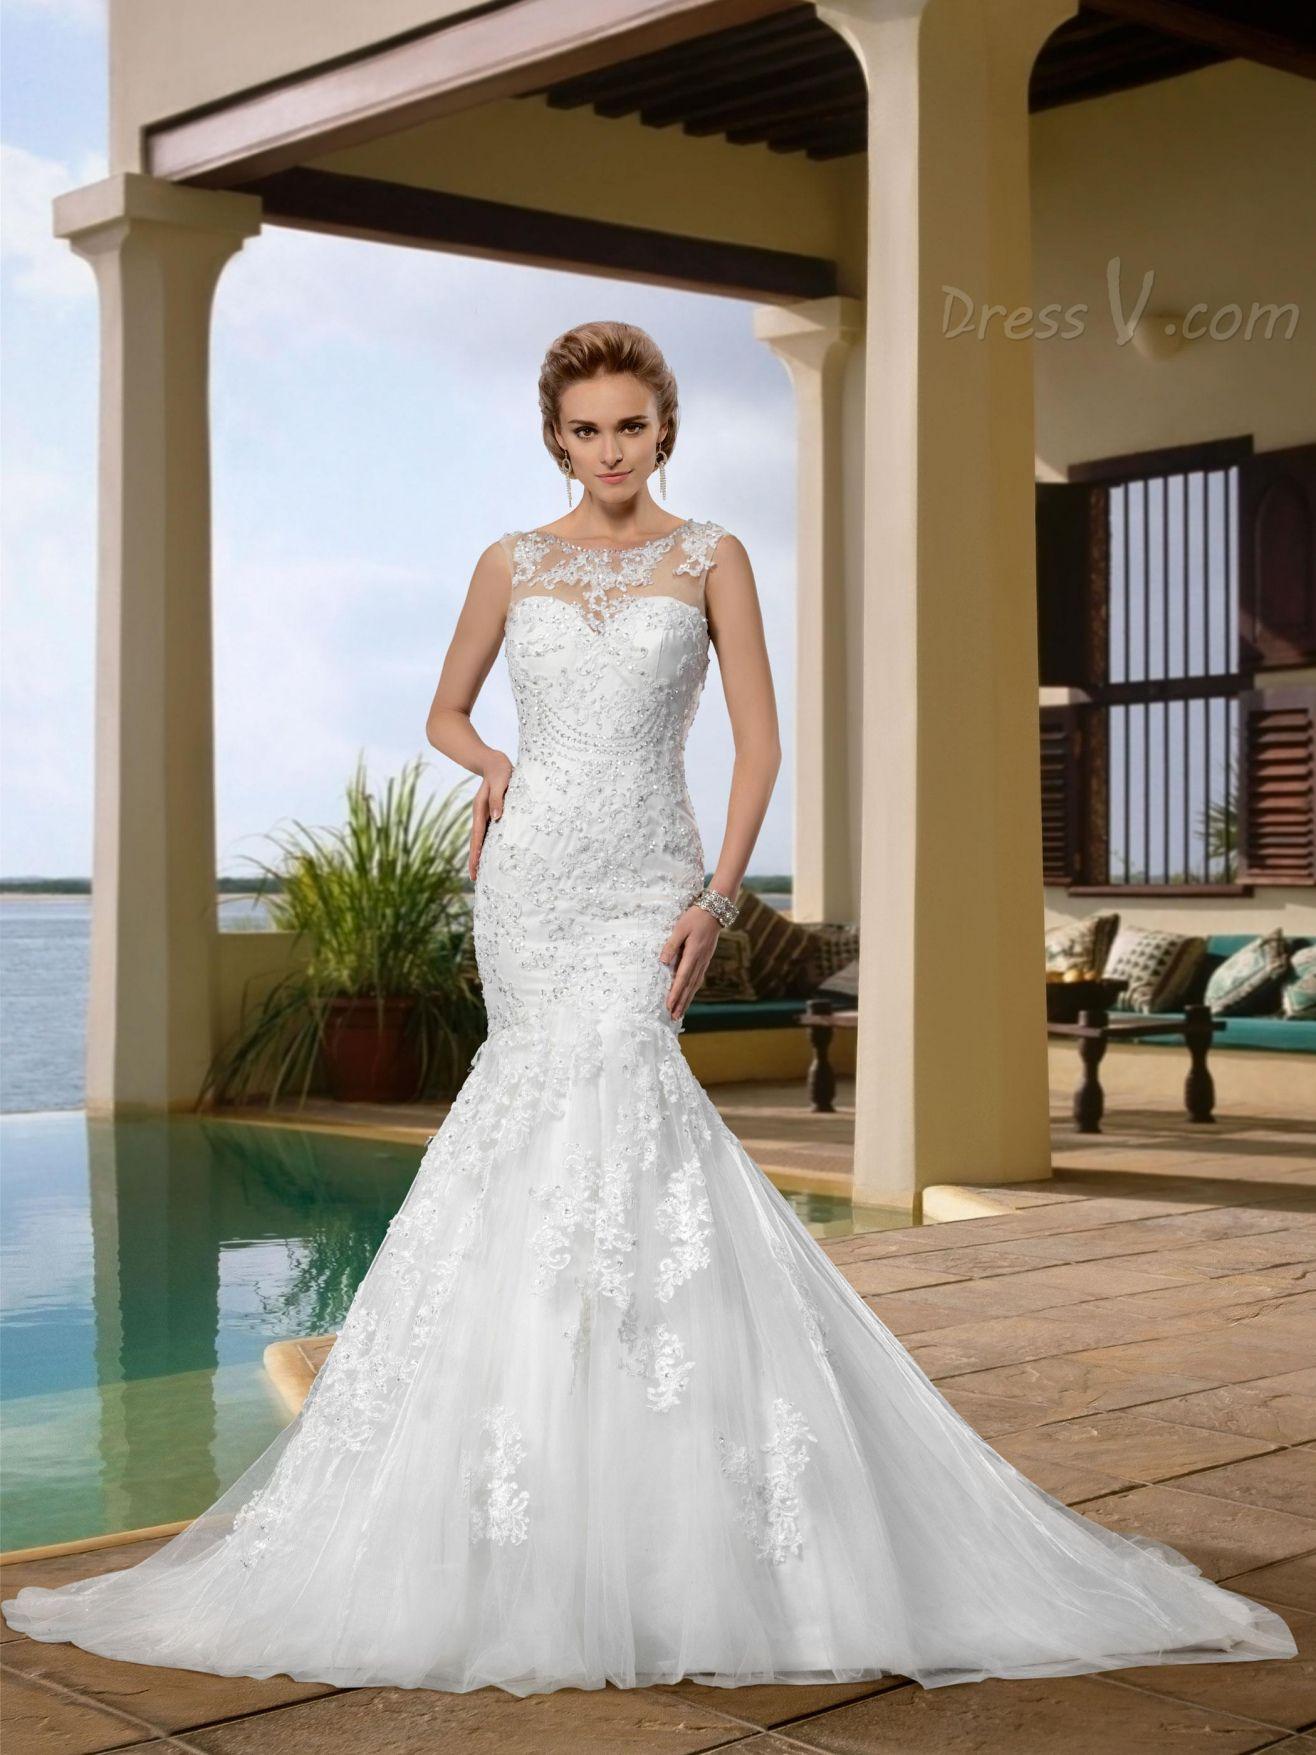 55+ Wedding Dress Rental Chicago - Cute Dresses for A Wedding Check ...